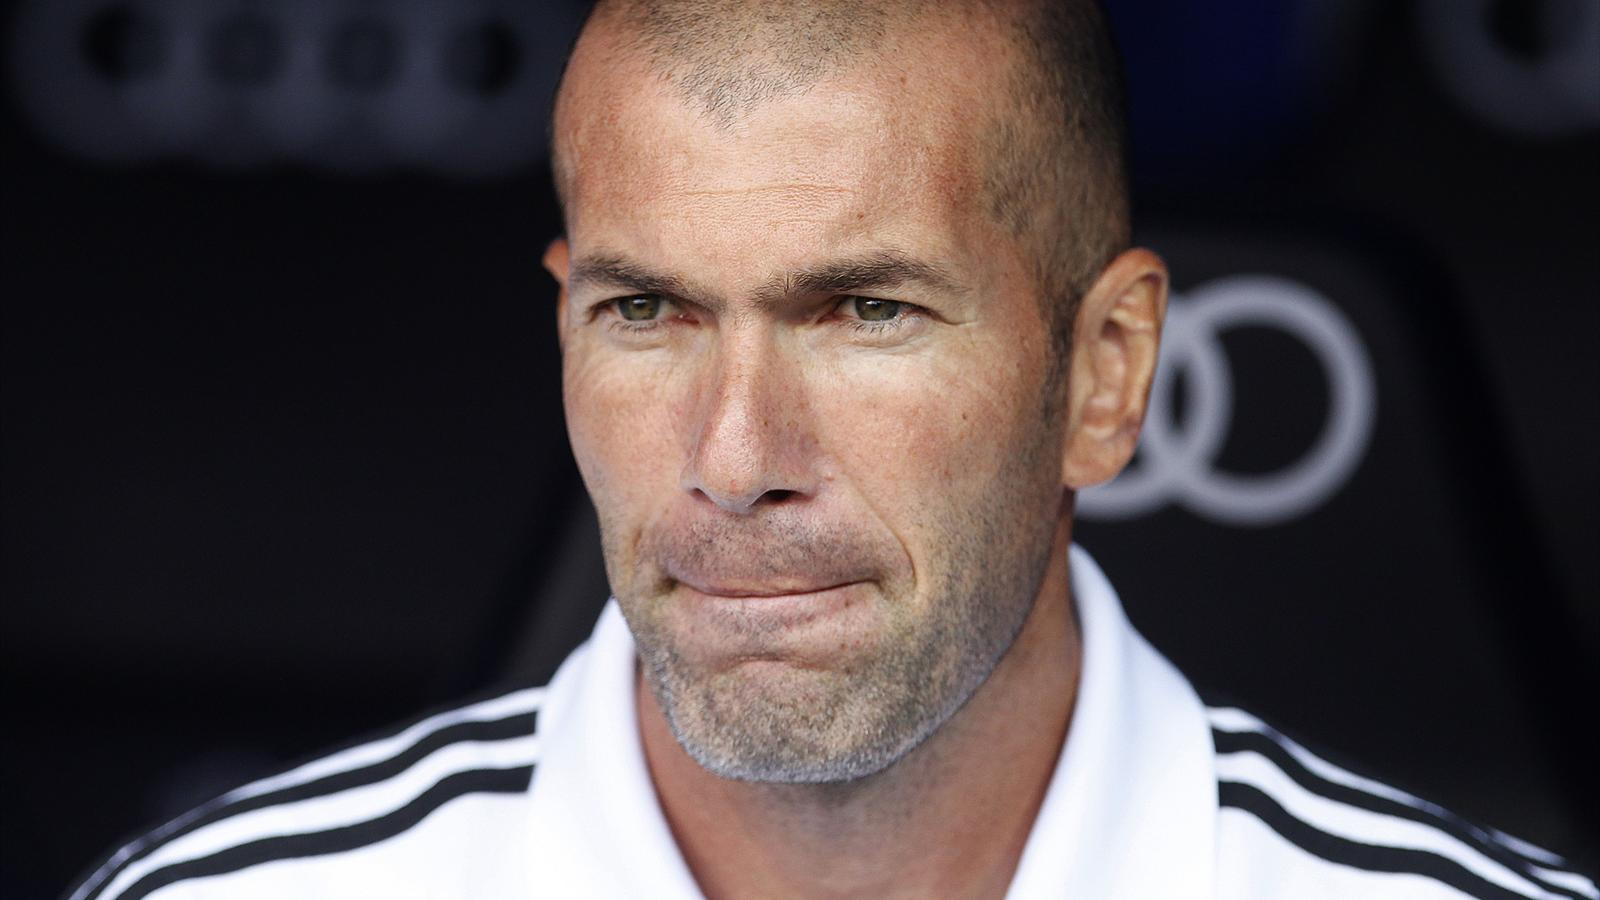 Football 2013 2014 real madrid zidane panoramic